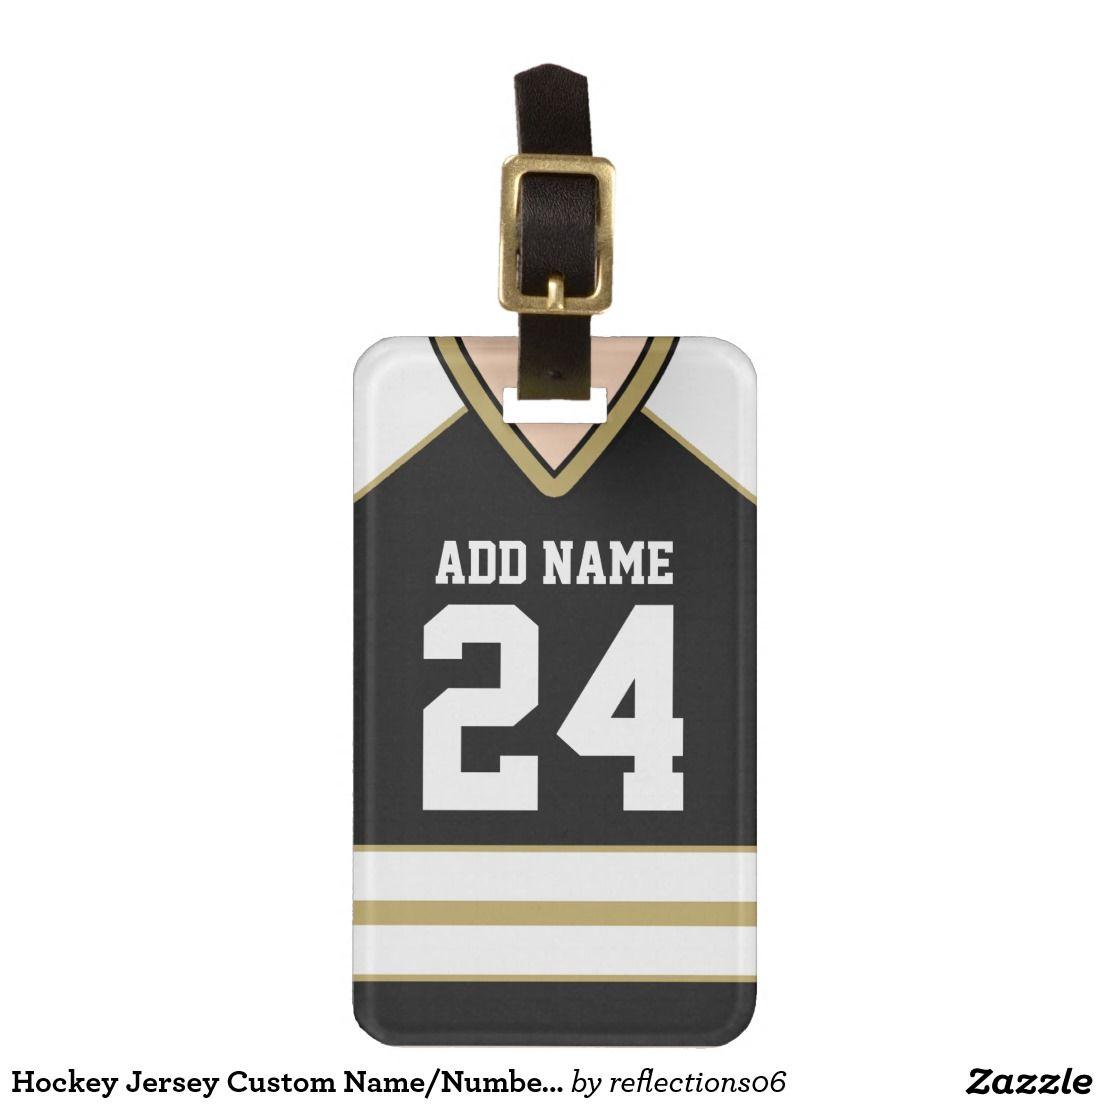 Hockey Jersey Custom Name Number Bag Tag Zazzle Com Hockey Jersey Hockey Jersey